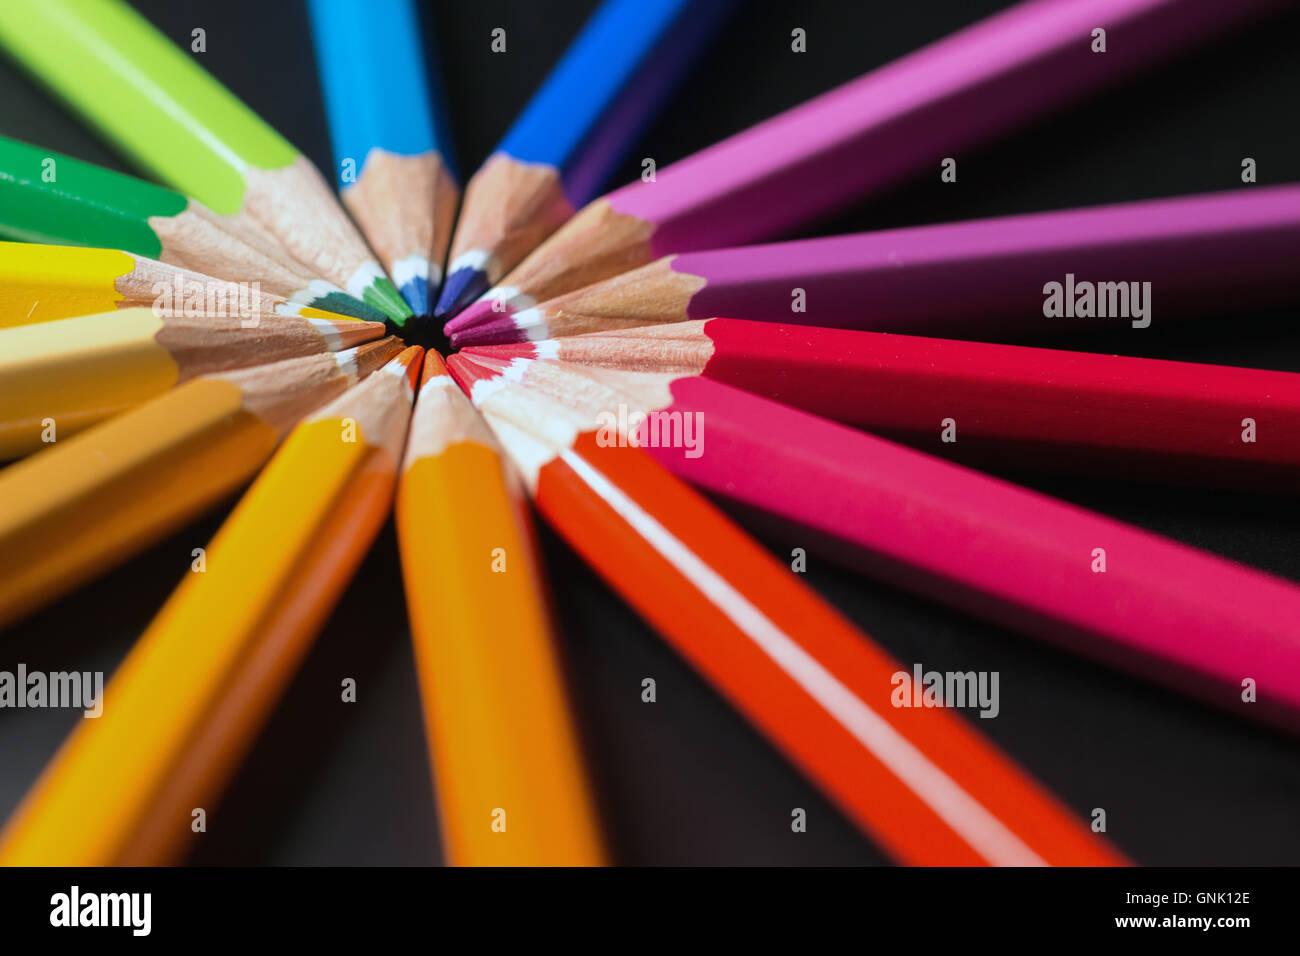 Color pencils in arrange in color wheel. Assortment of colored pencils. - Stock Image